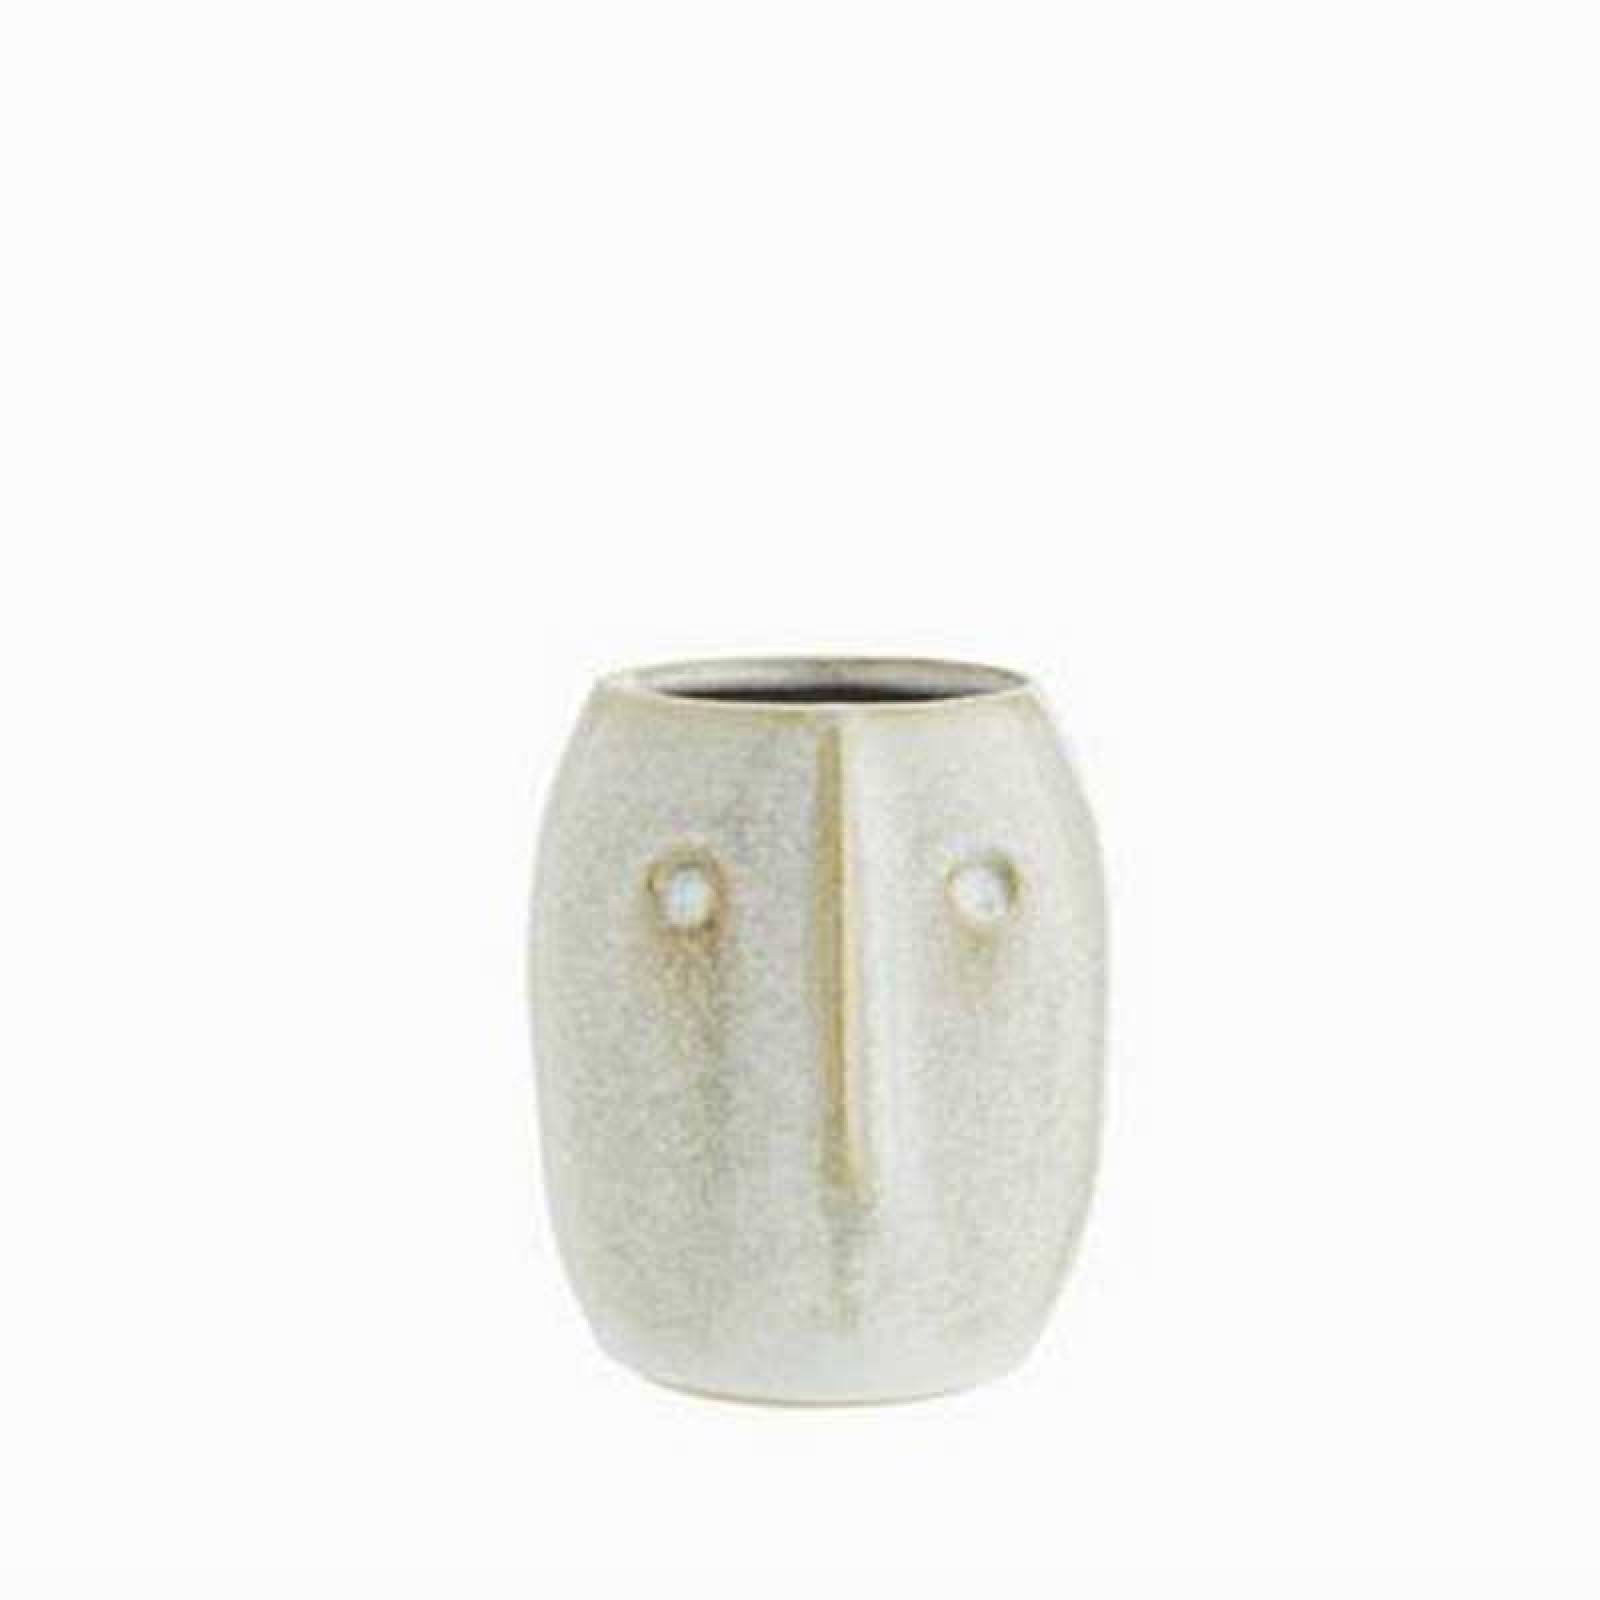 Off White Stoneware Curved Face Vase 10cm